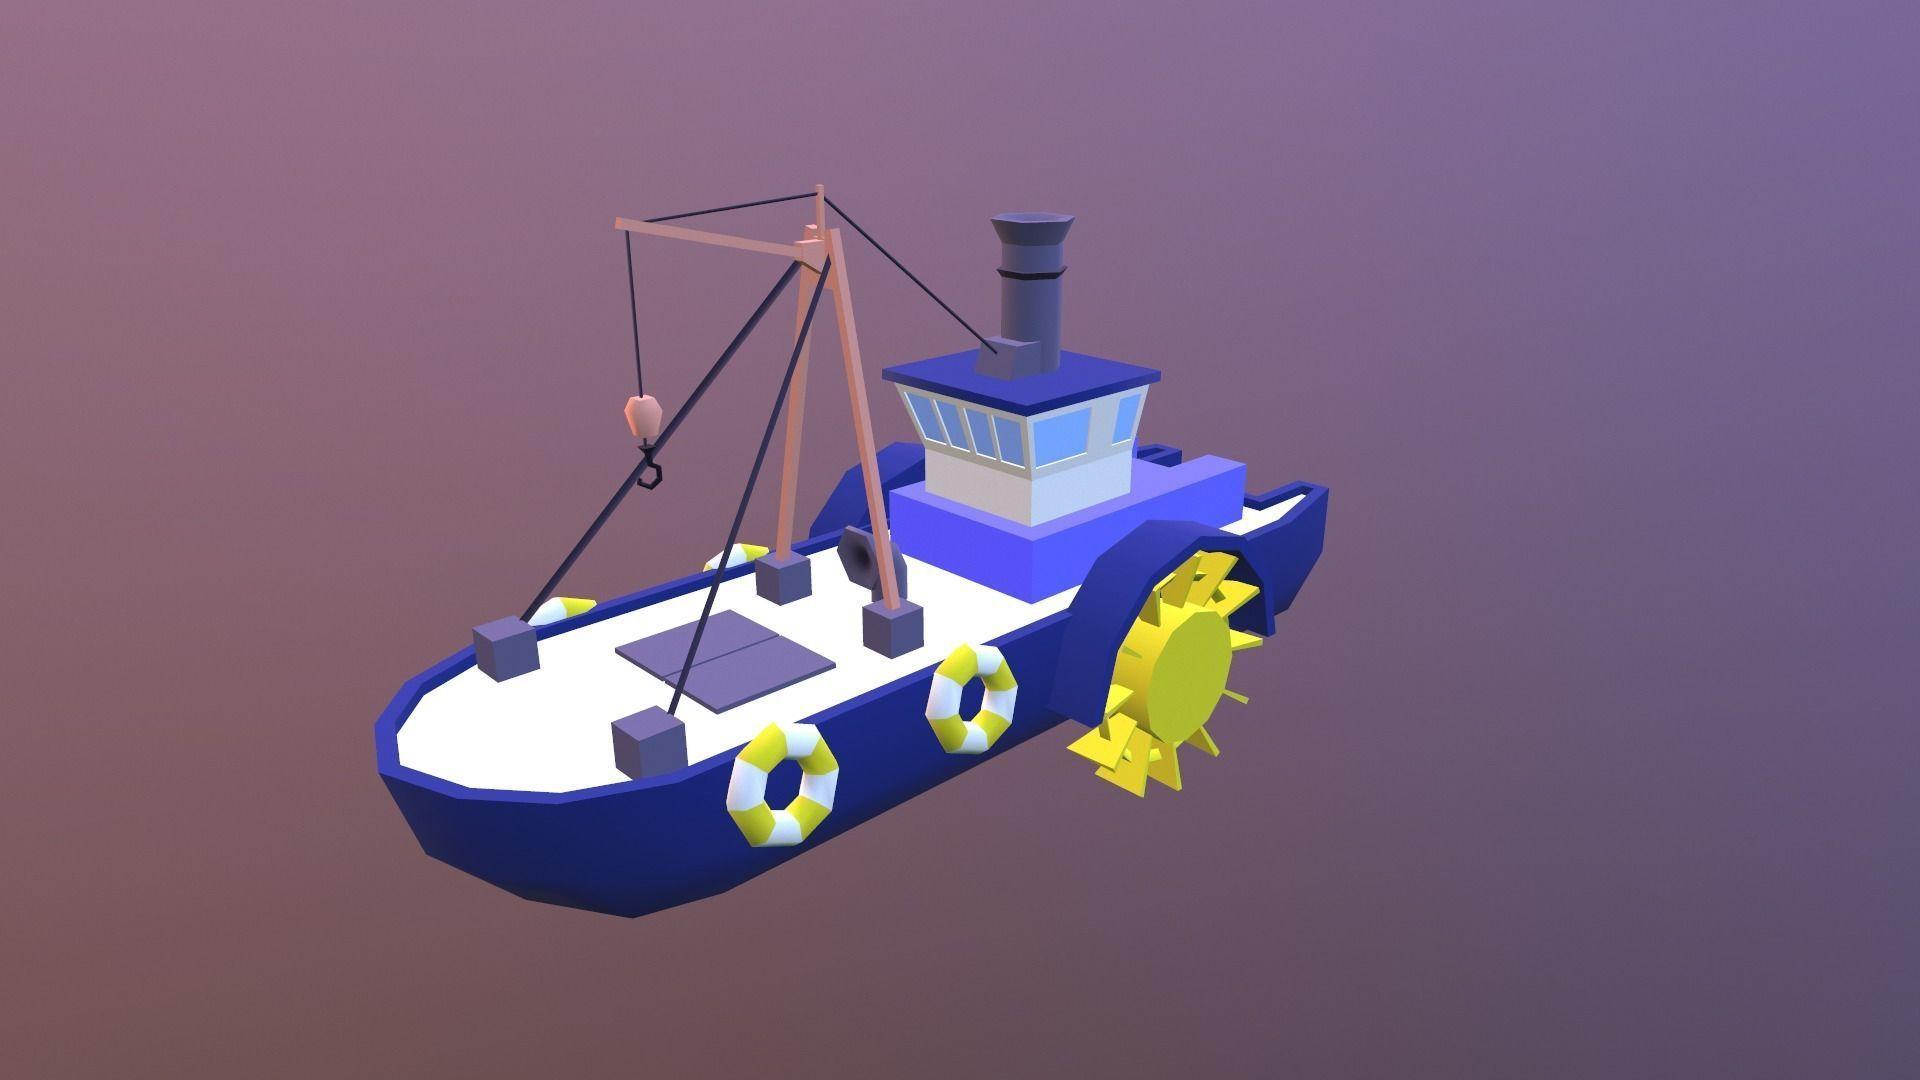 Low poly ship